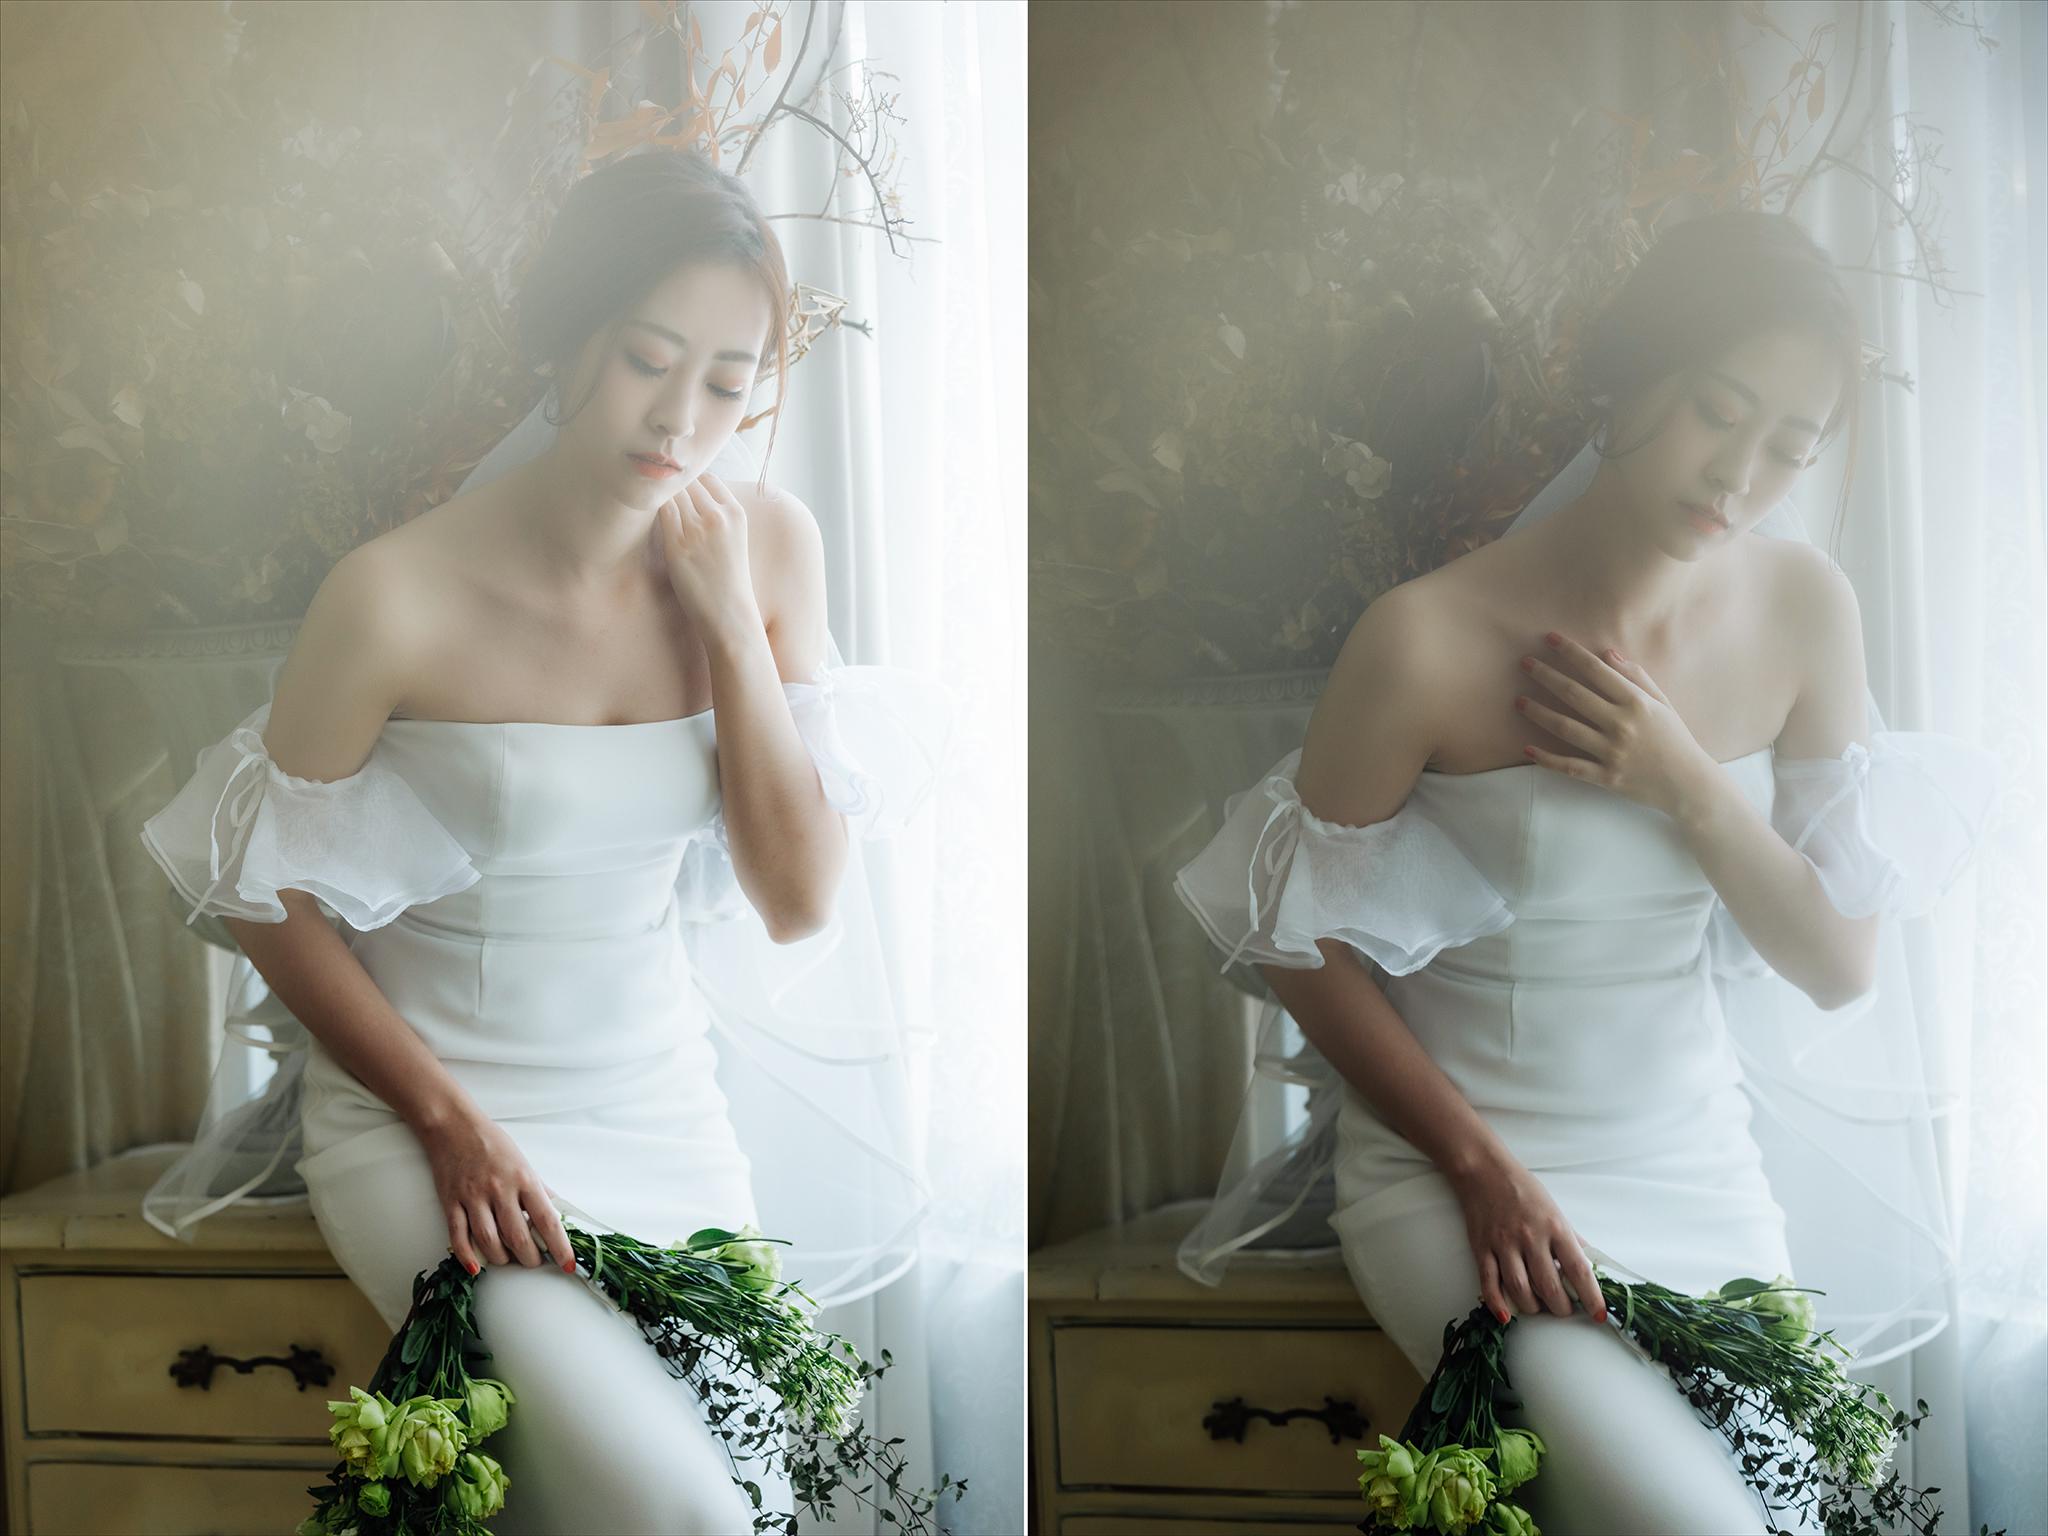 49929256001 b00e181df1 o - 【閨蜜婚紗】+Jessy & Tiffany+